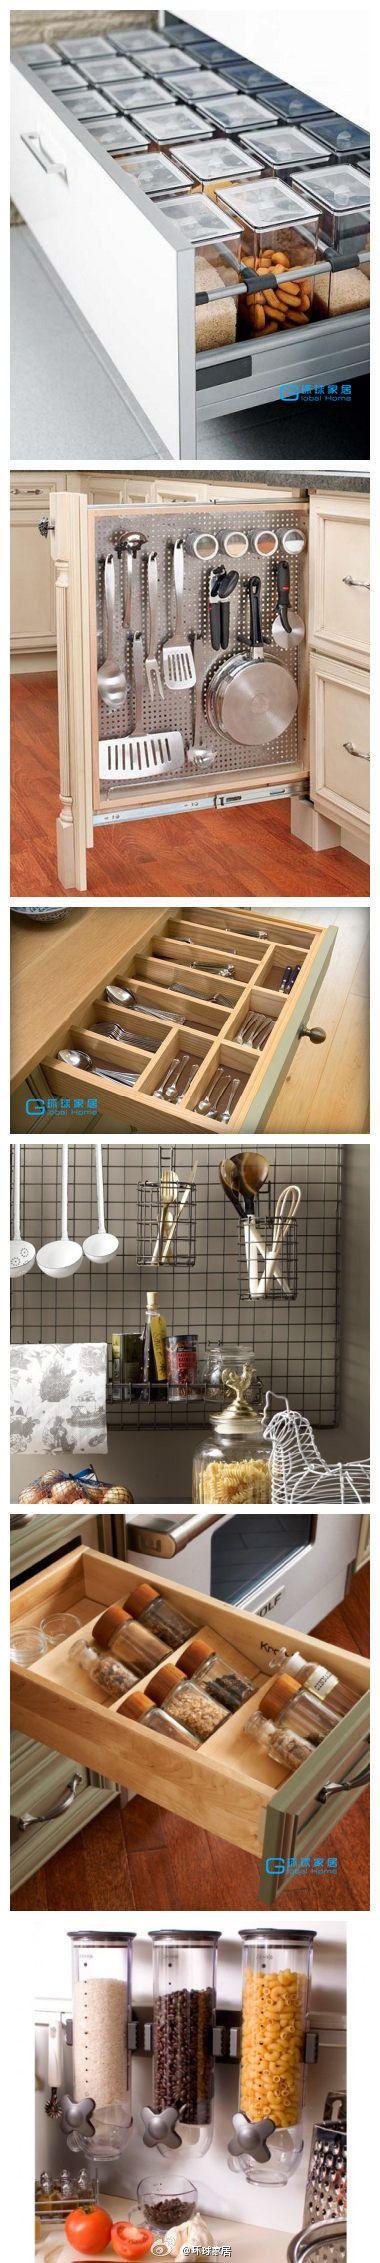 organizing the kitchen pantry